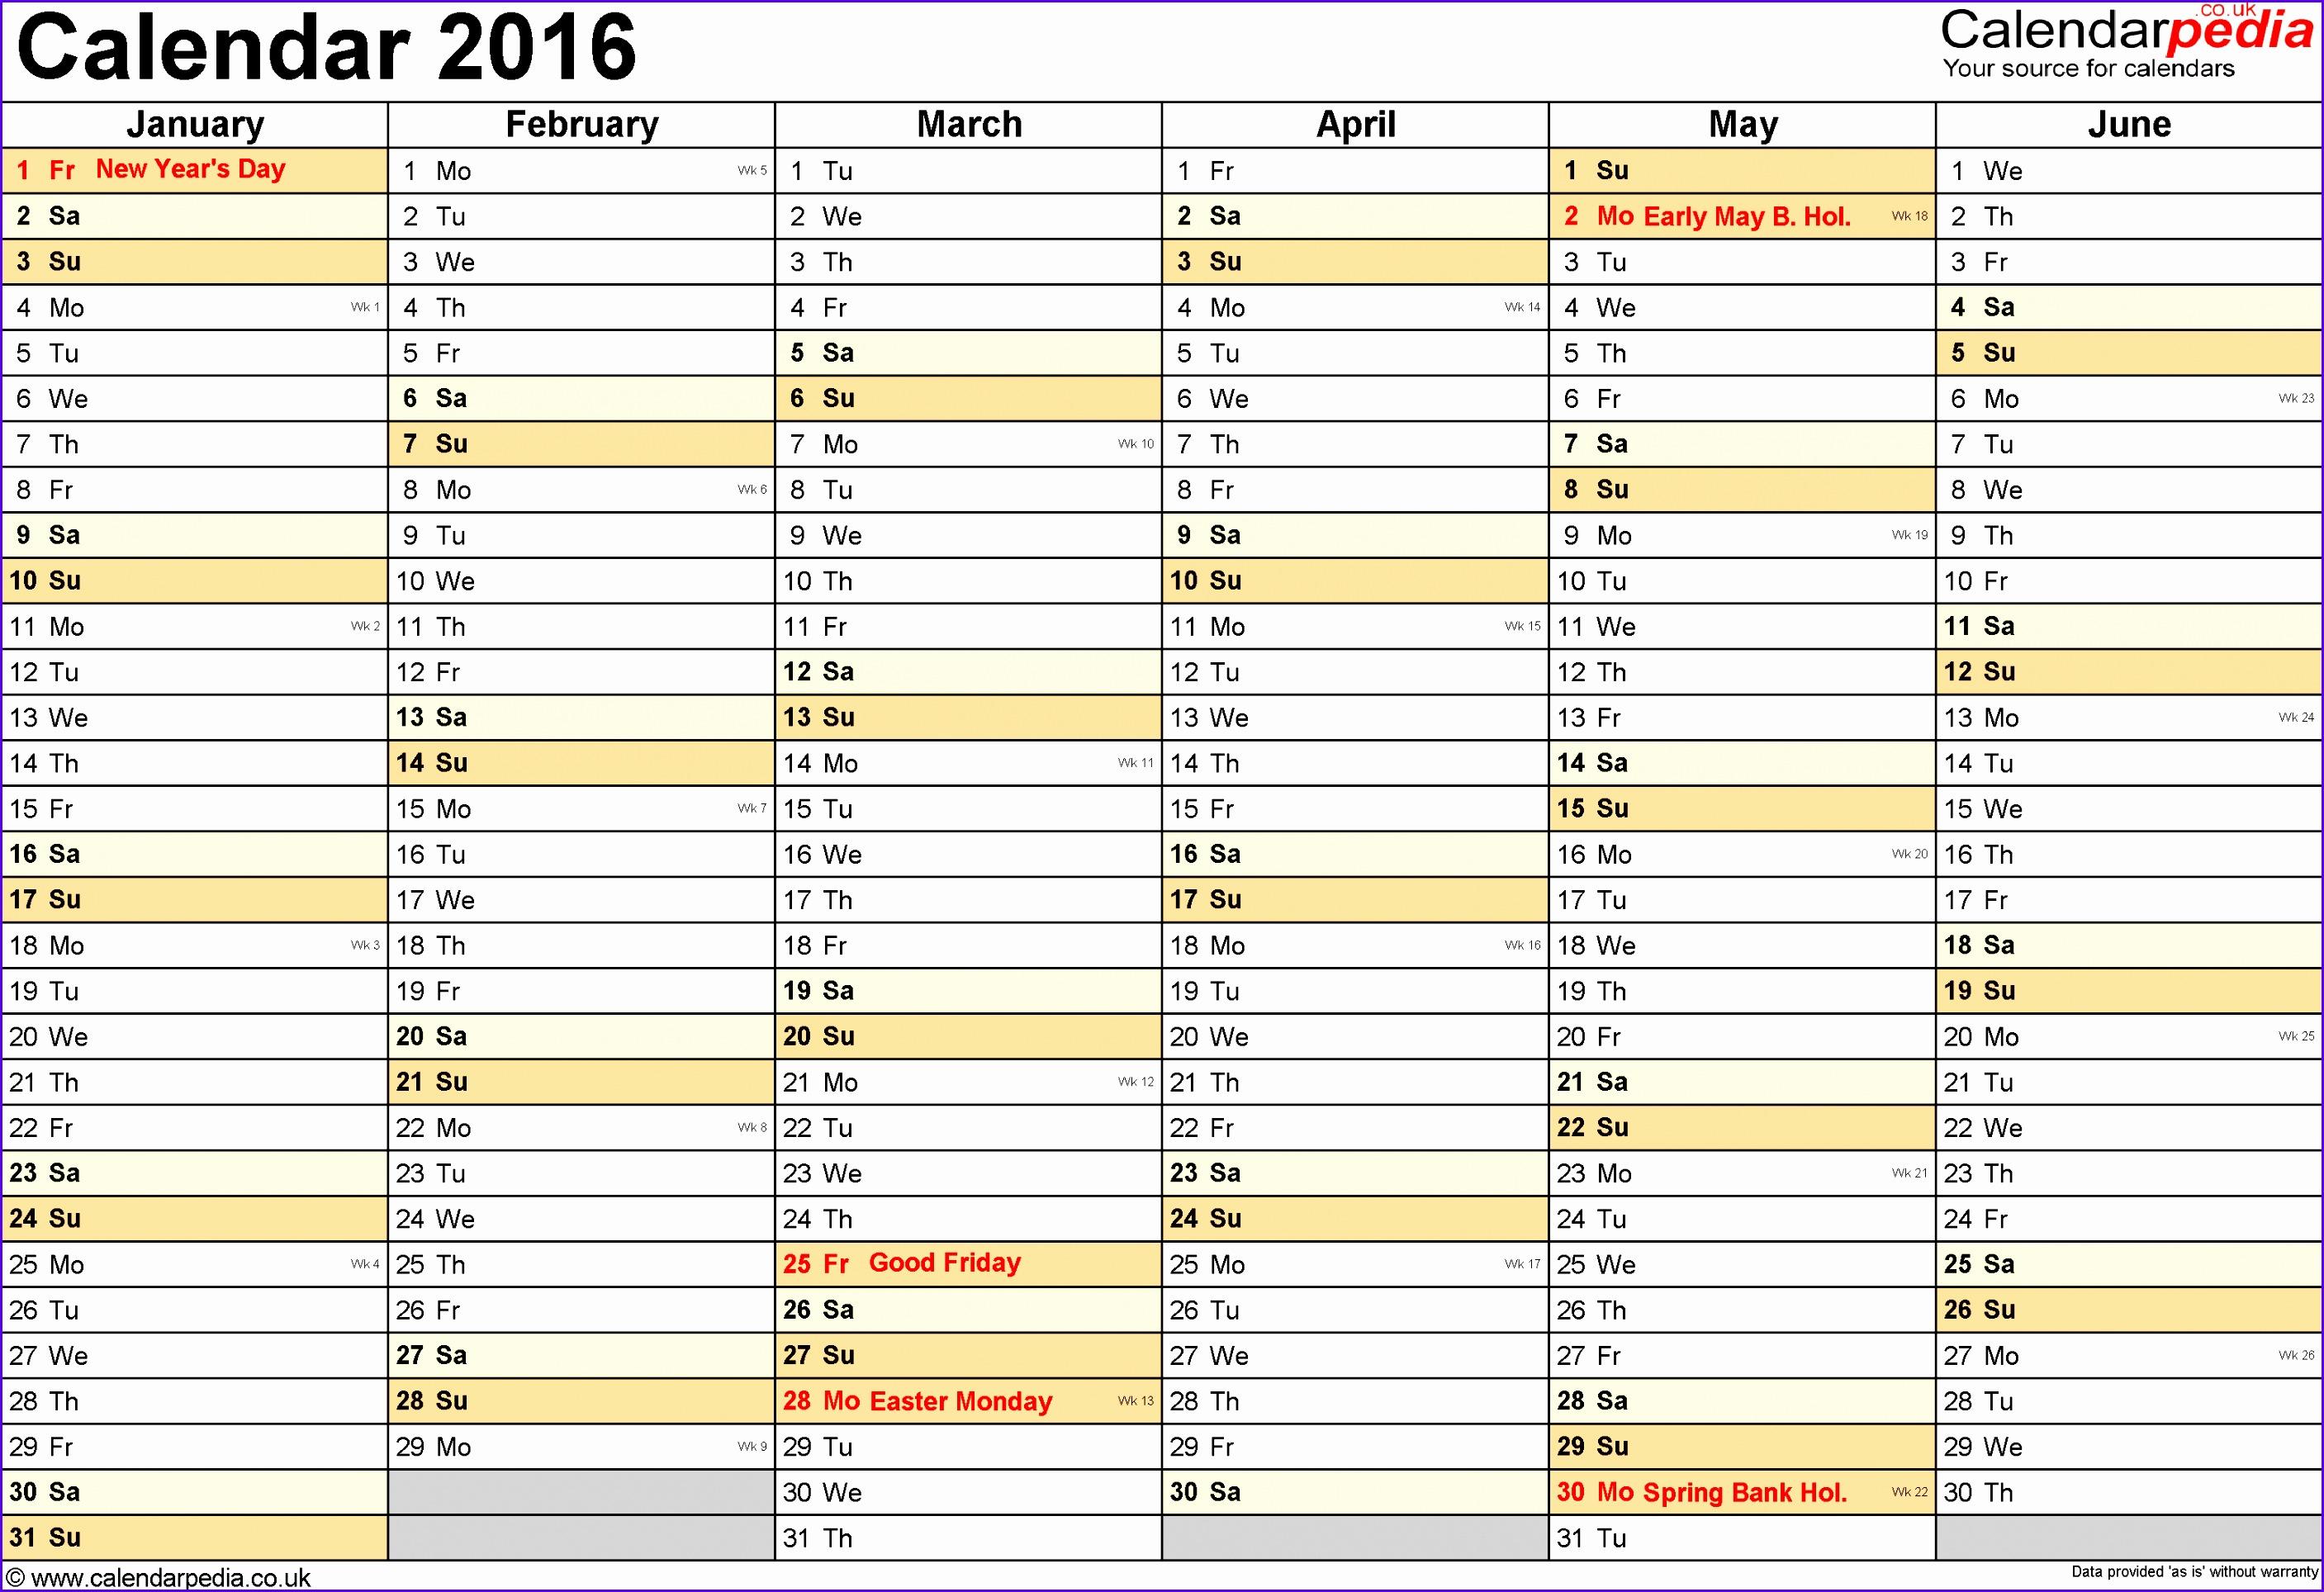 calendar 2016 printable 28141928